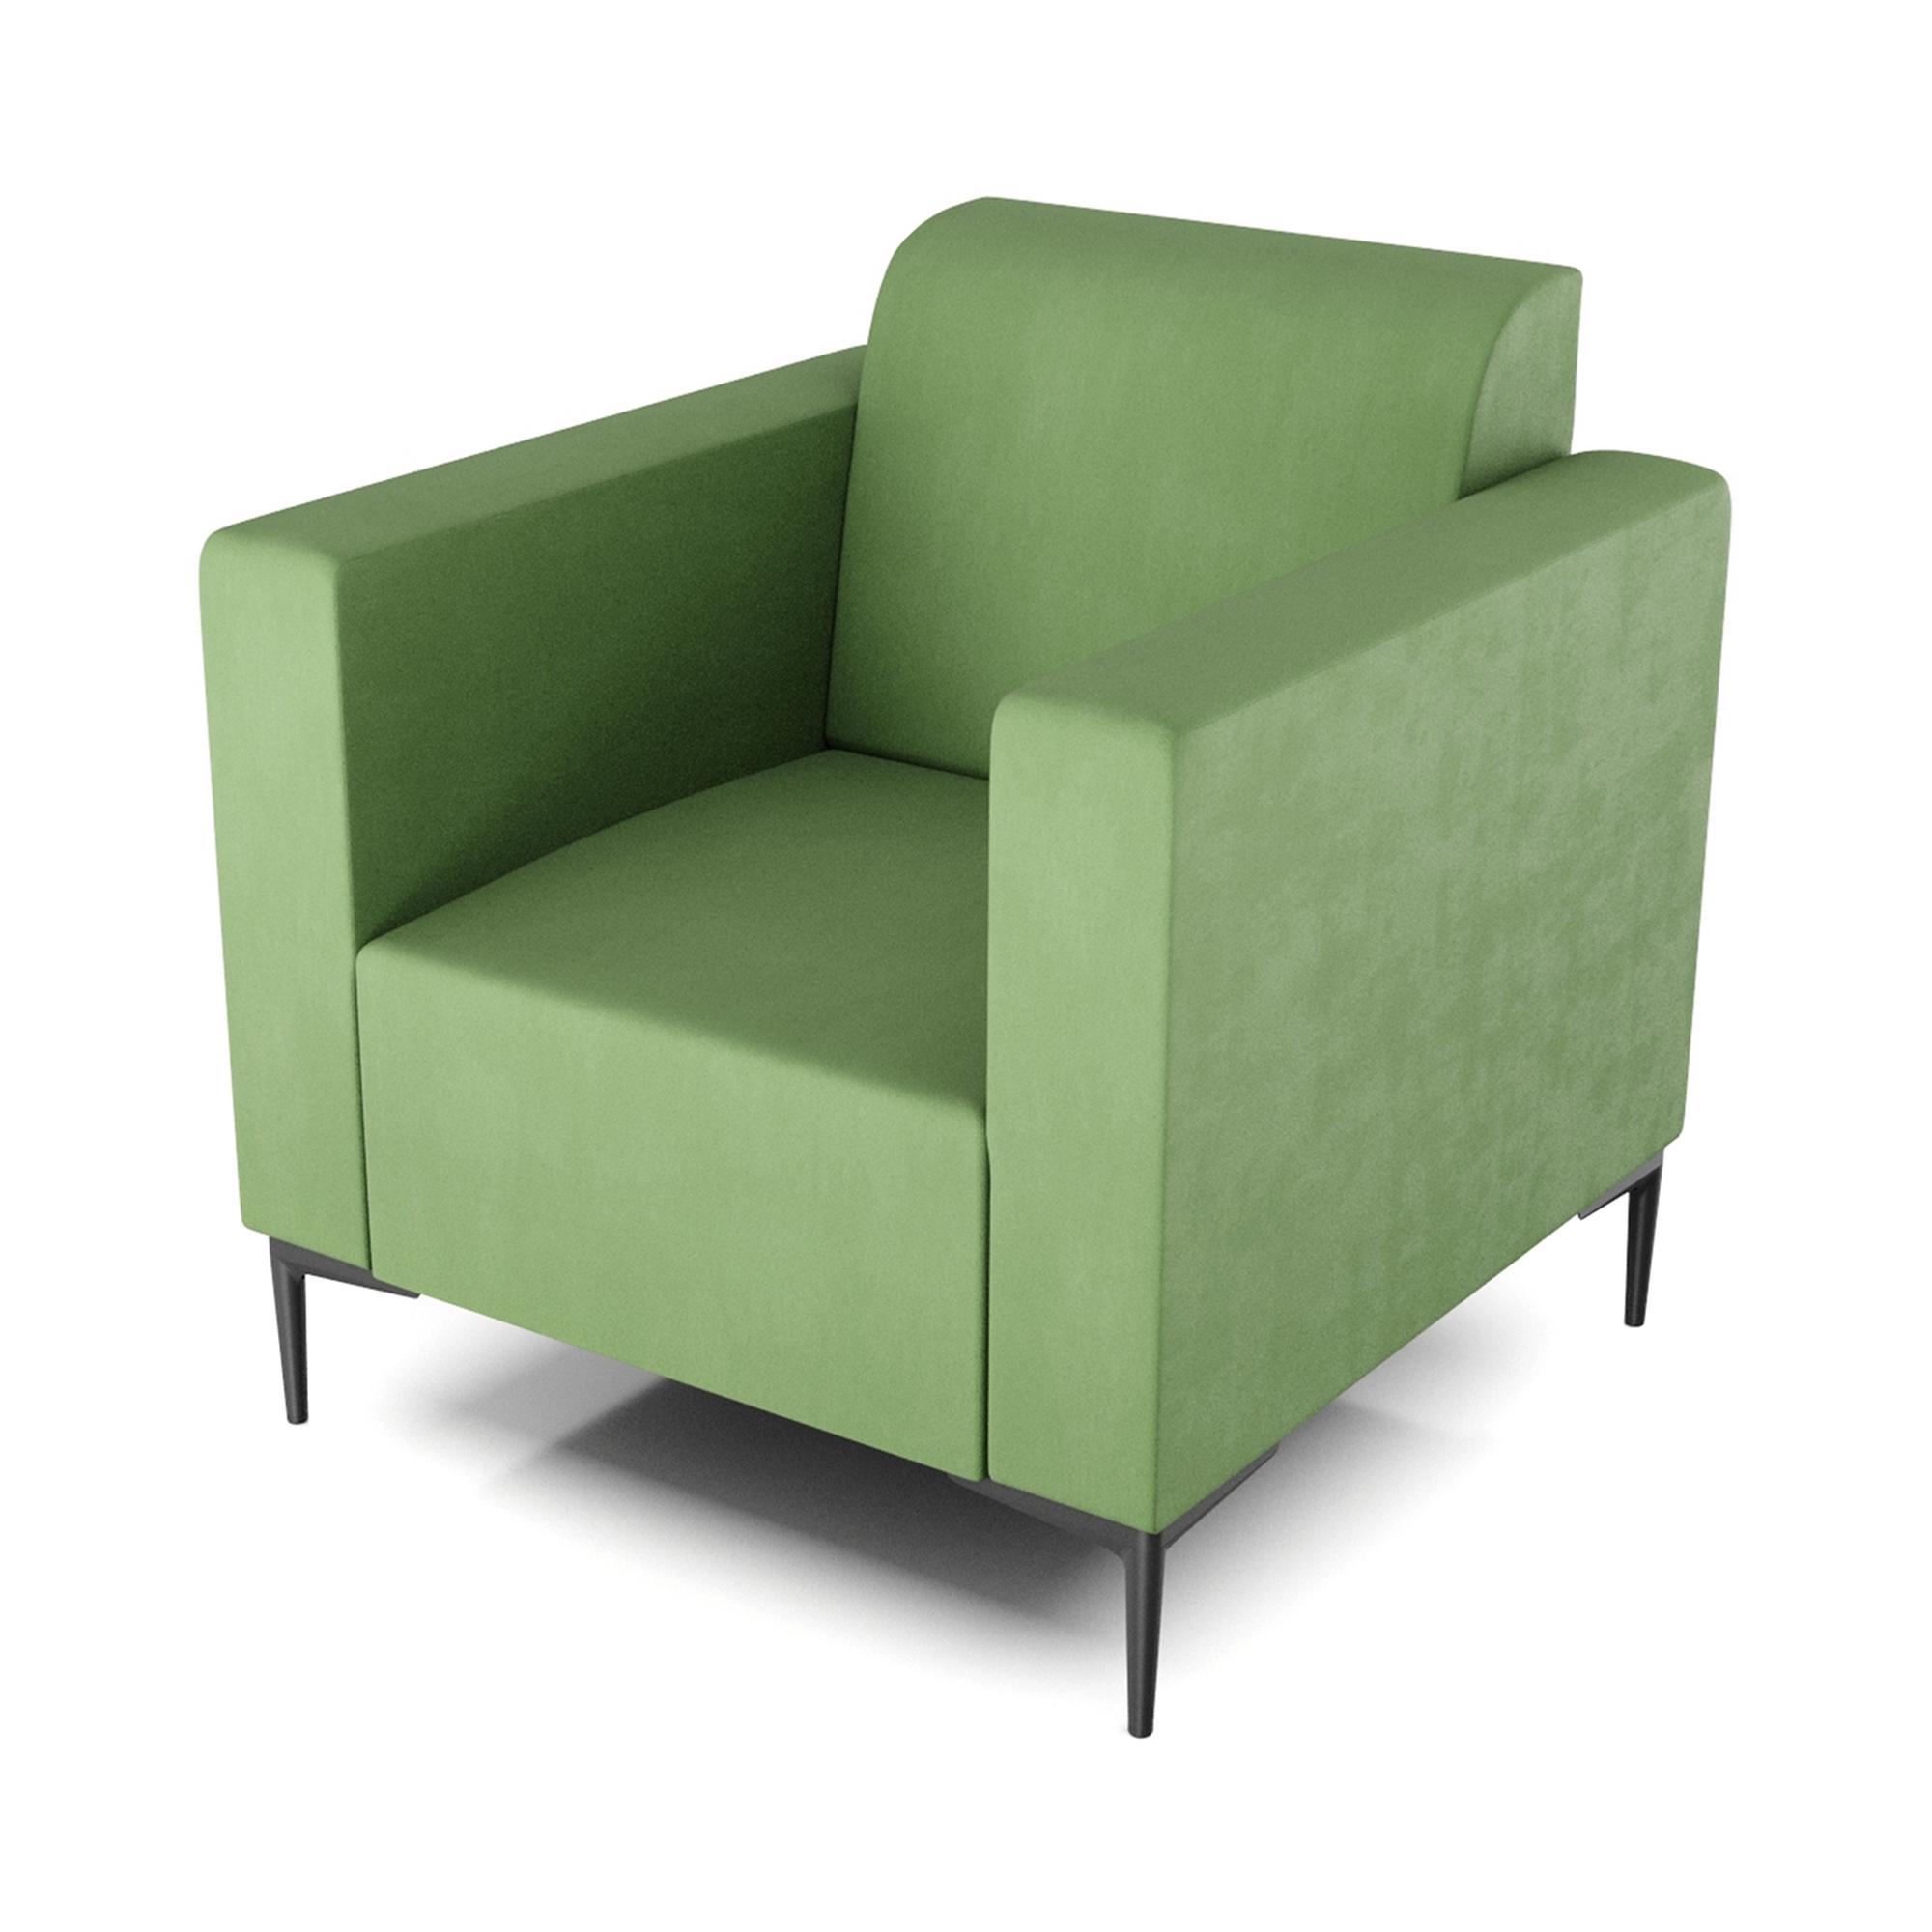 Кресло AS Тиффани 79x78x73 см зеленый кресло as тиффани 79x78x73 см коричневый